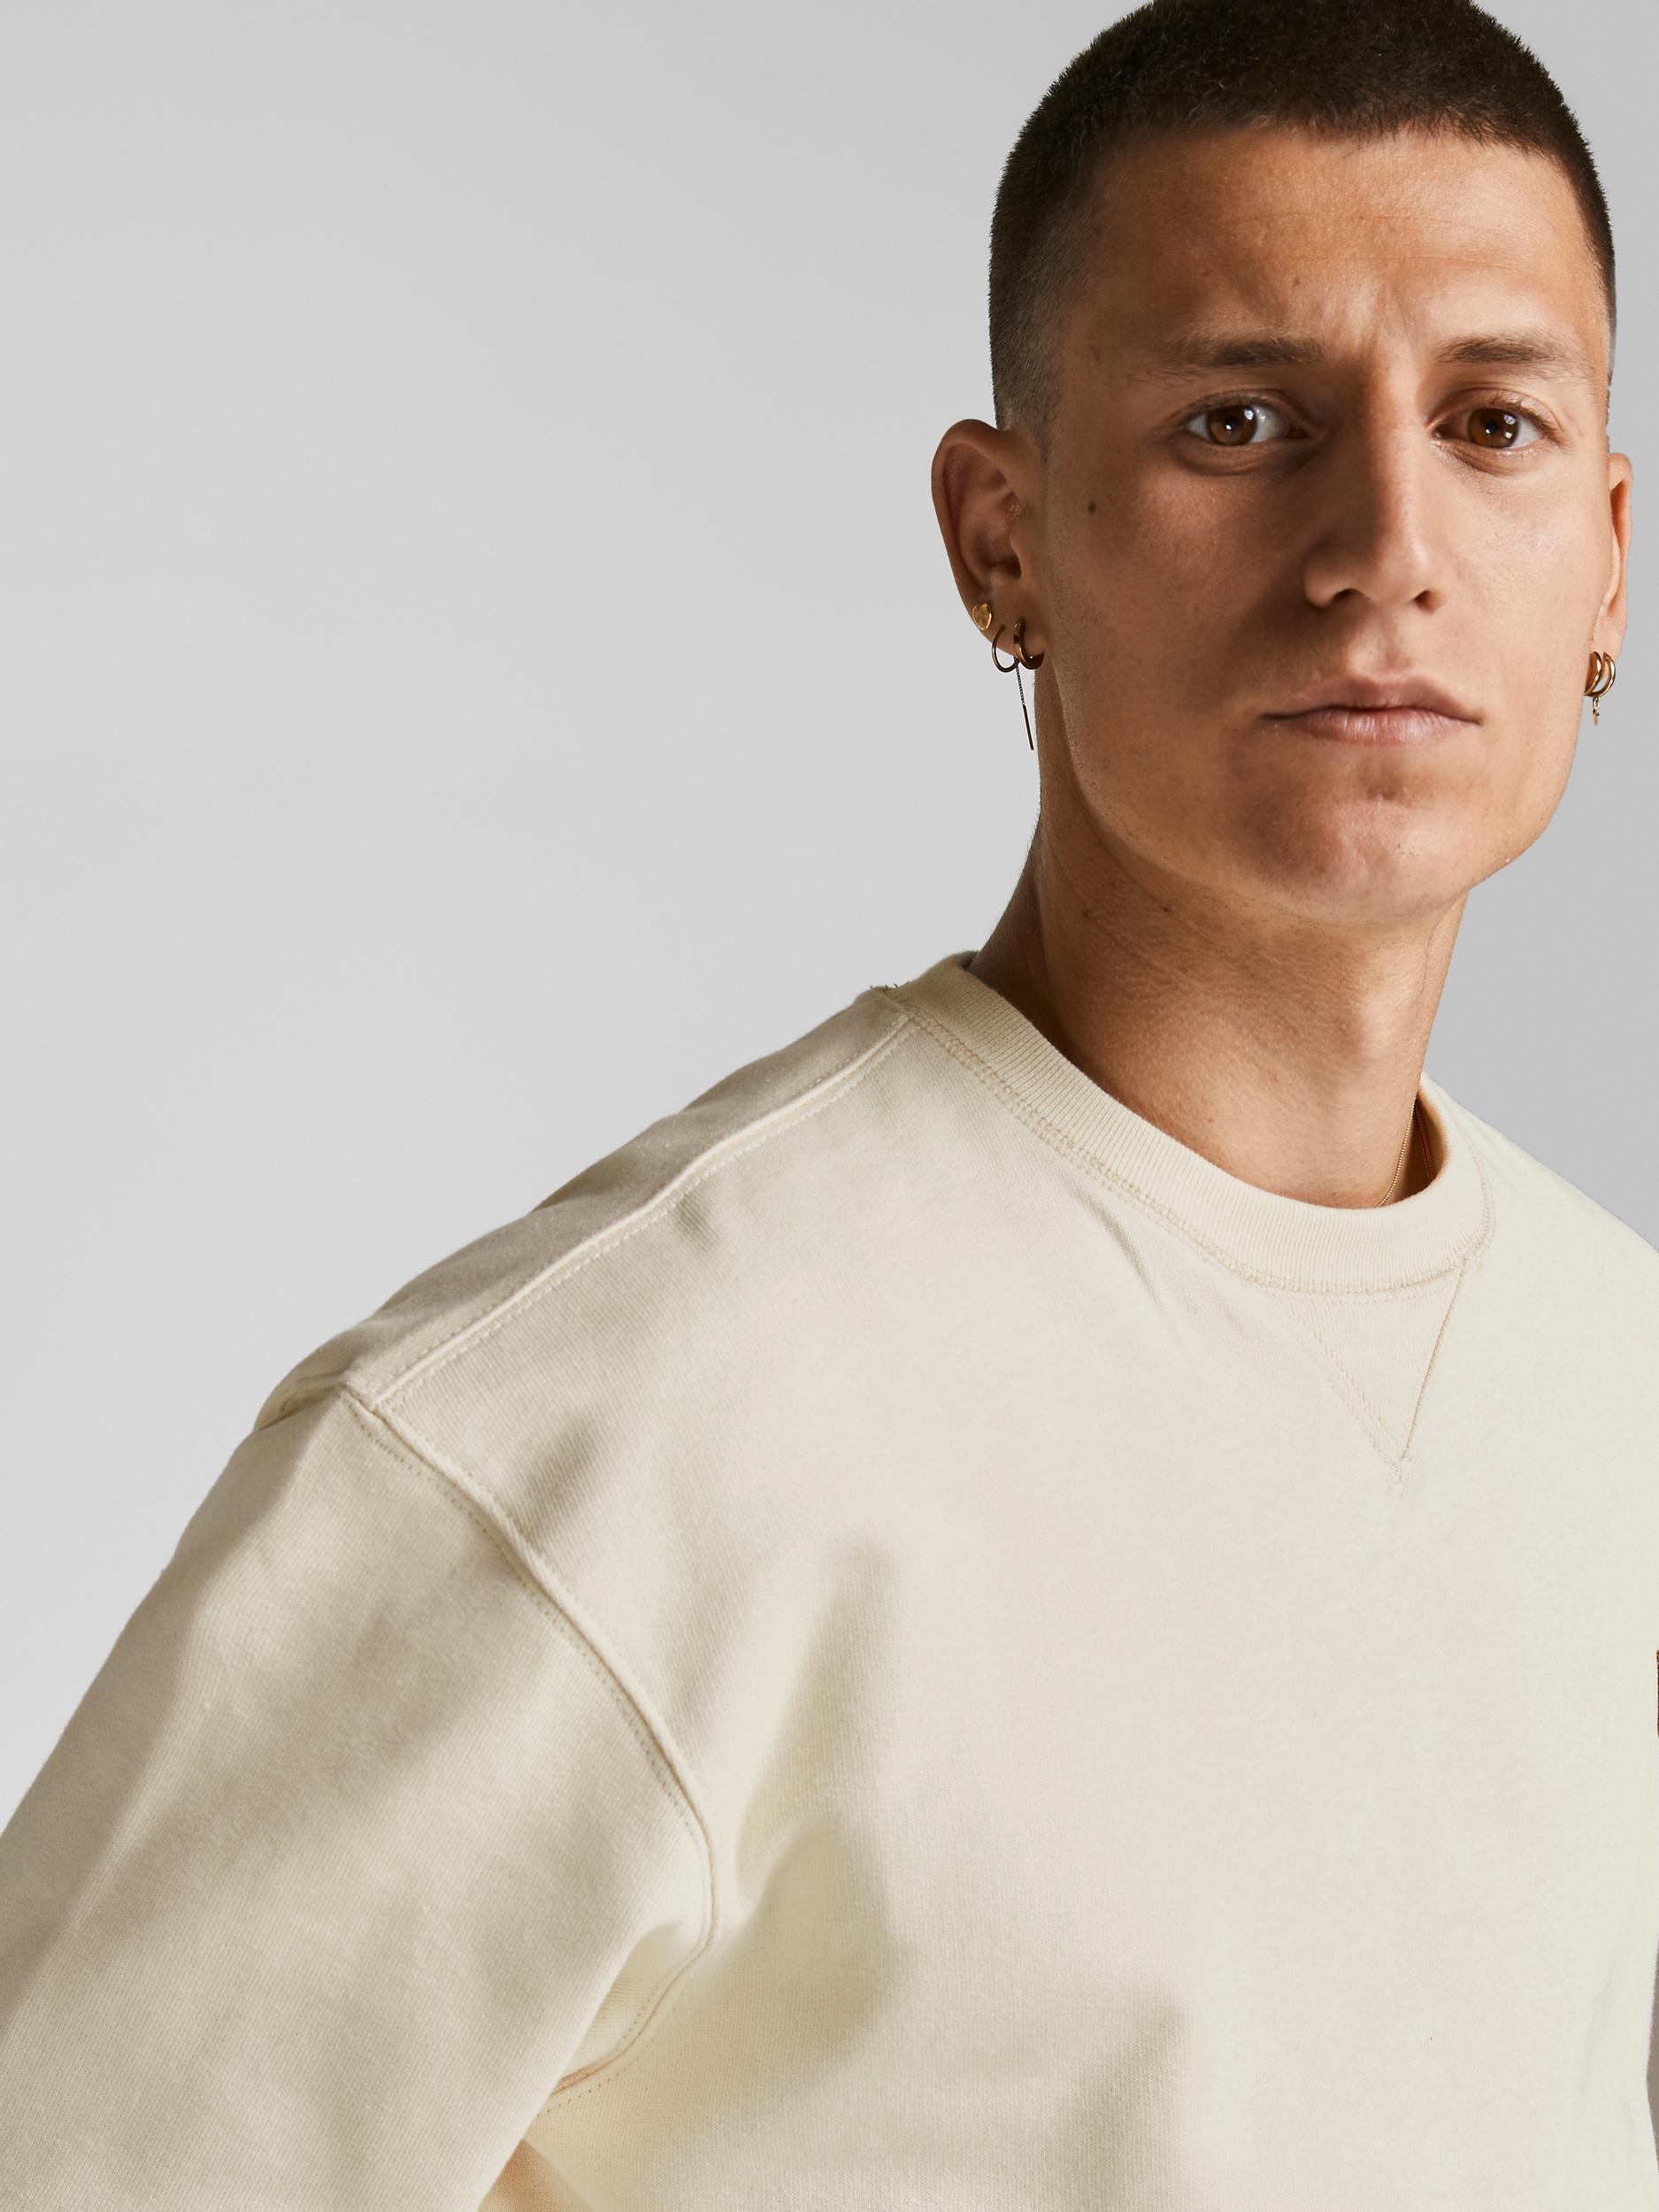 Jack & Jones 12193755 sweatshirt, whisper white, large